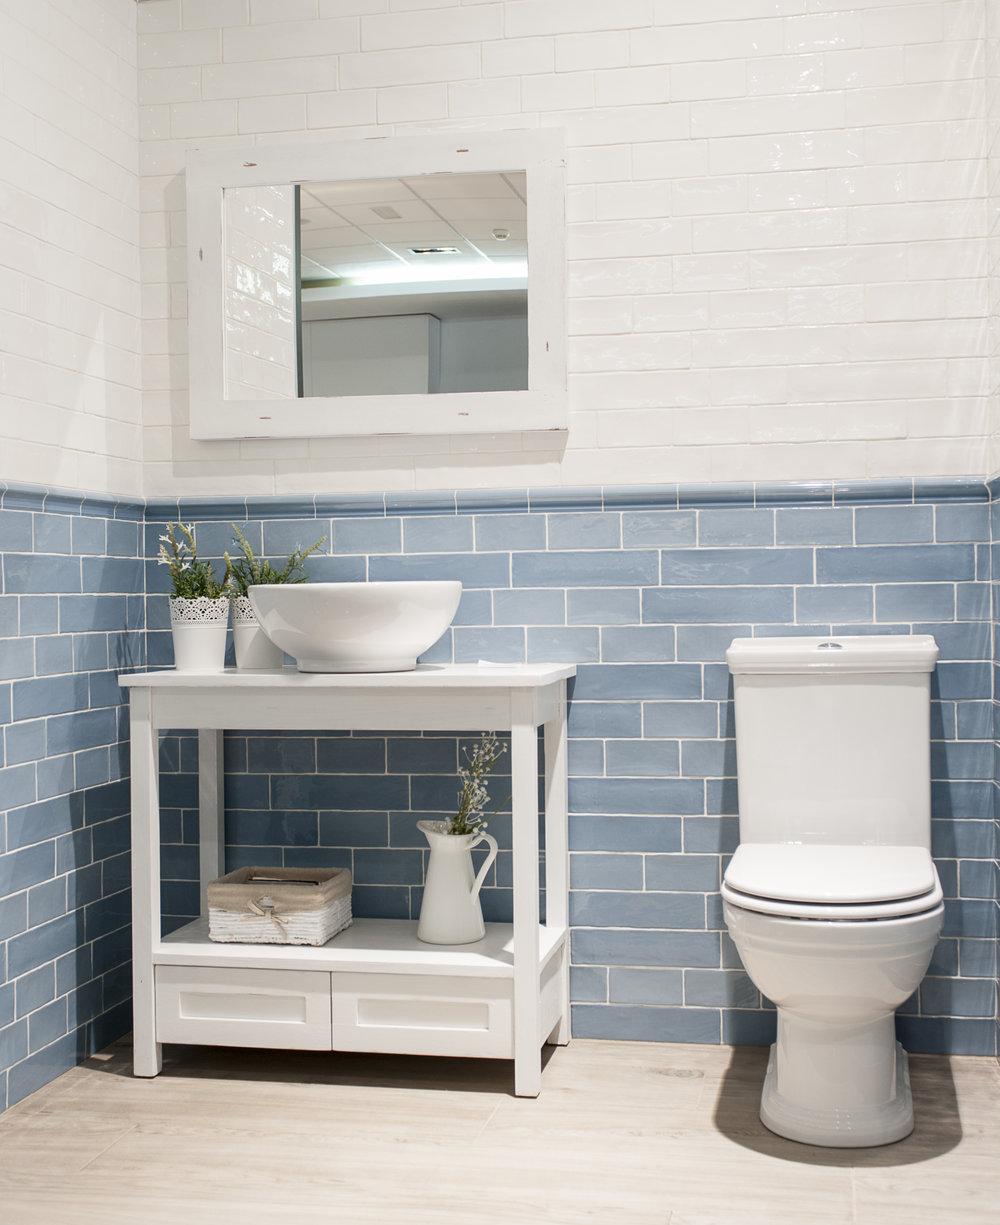 muebles de baño Fuerteventura